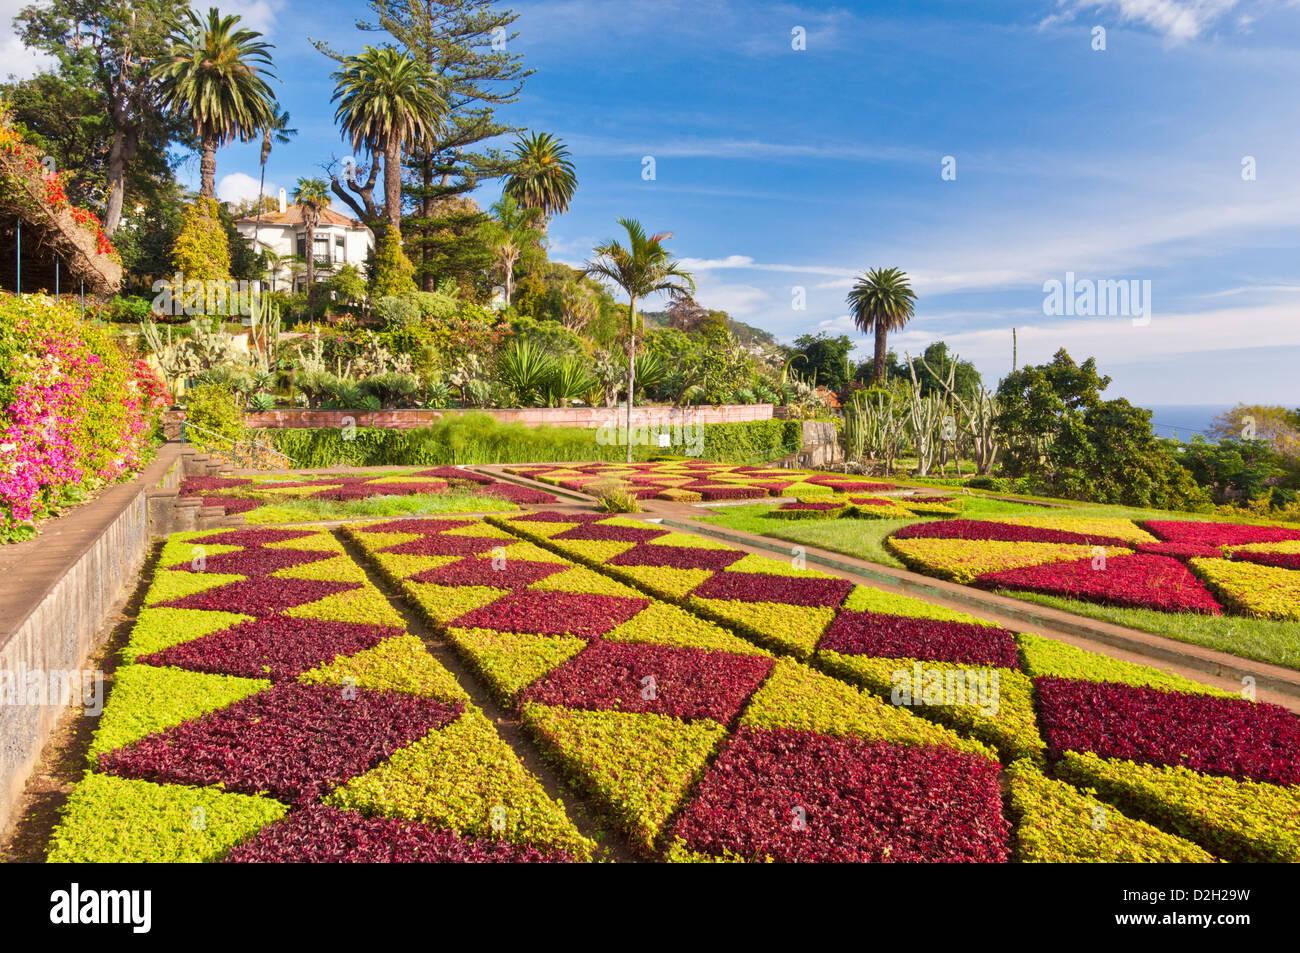 Formal garden display in the Botanical gardens Jardim Botanico Madeira Portugal EU Europe - Stock Image